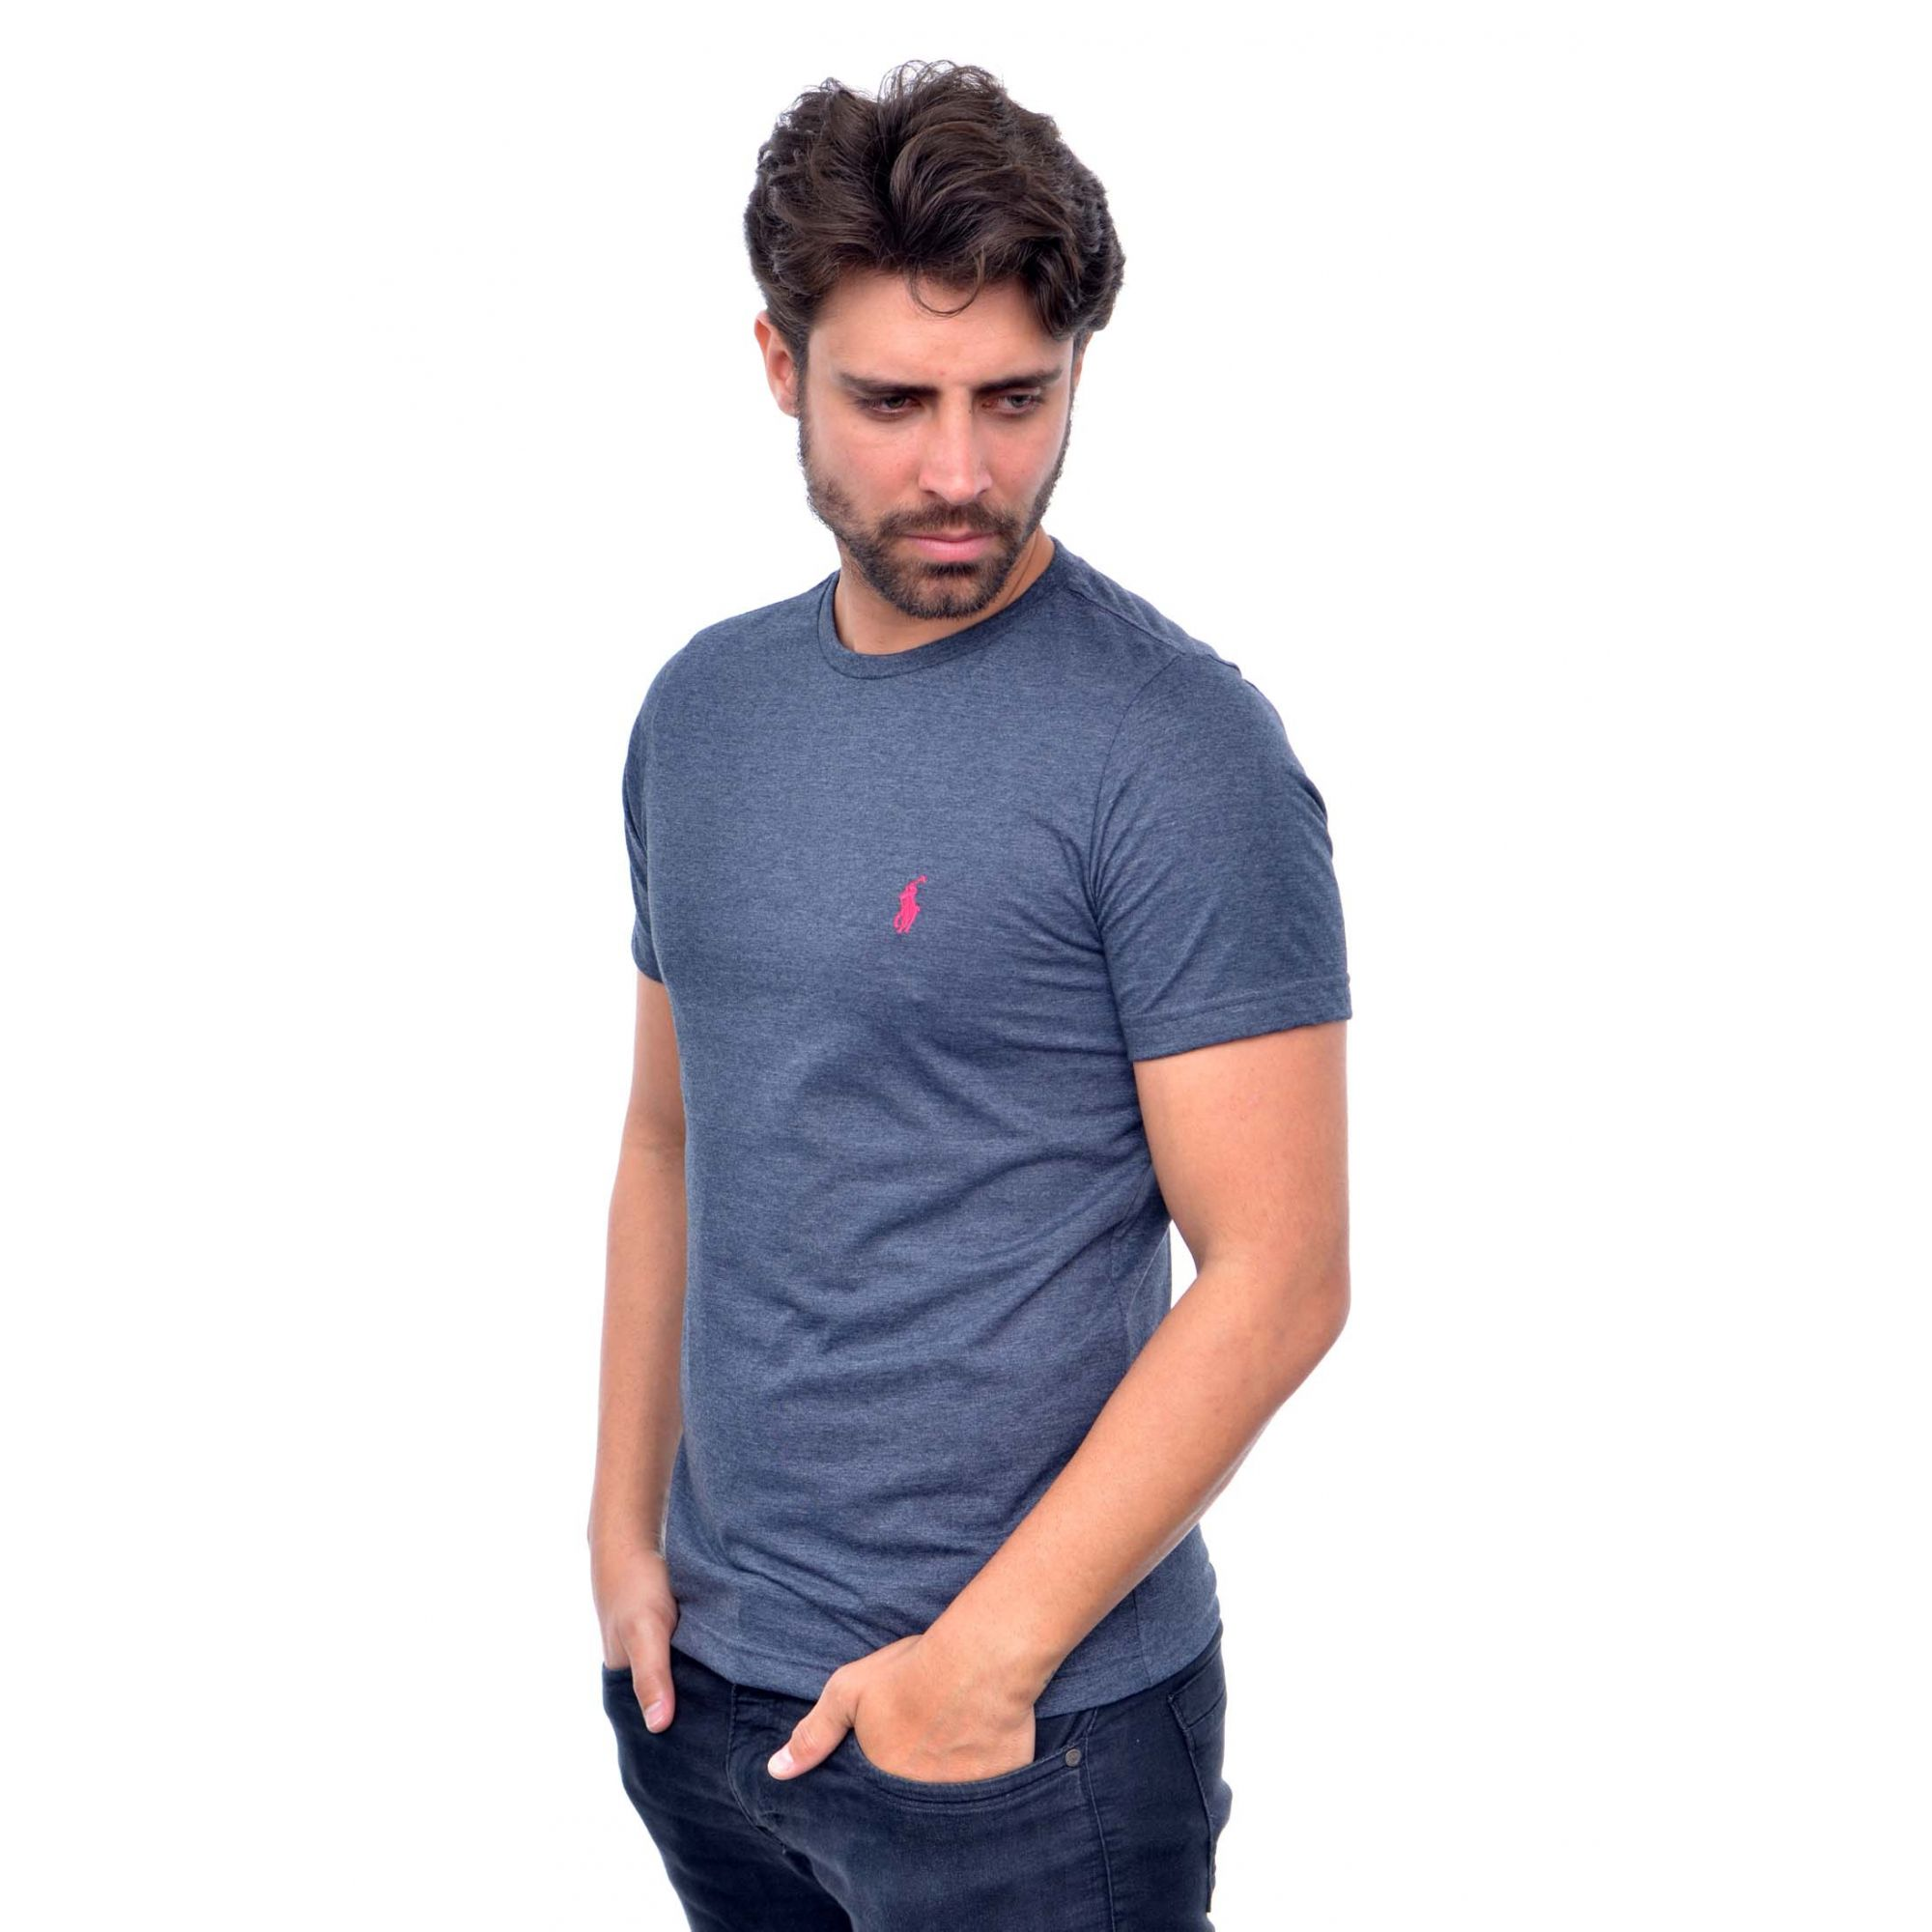 Camiseta Basic RL Mescla Escuro  - Ca Brasileira